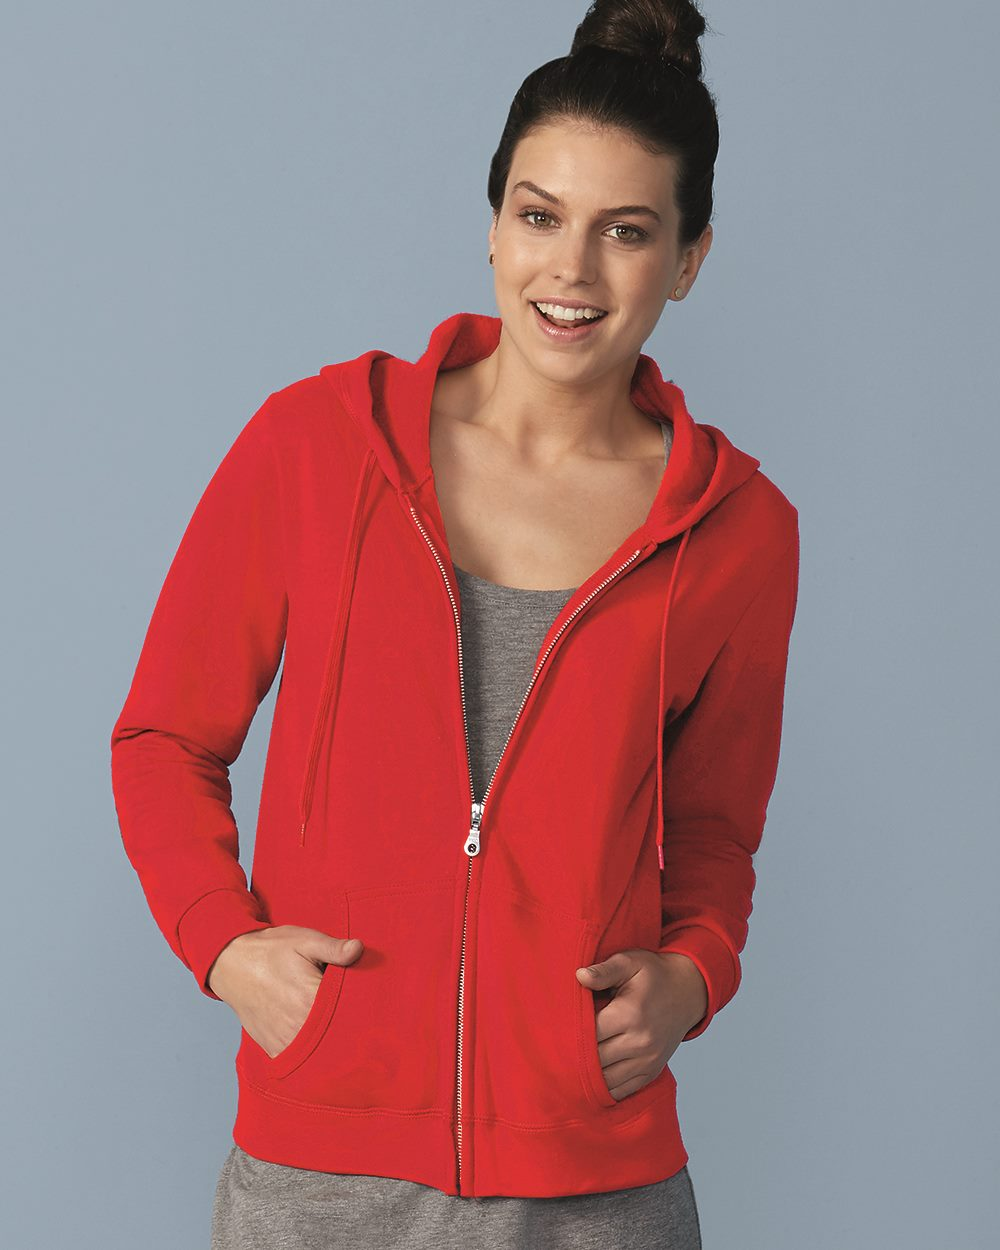 c77431e9c07 Gildan 18600FL - Heavy Blend Women s Full-Zip Hooded Sweatshirt ...